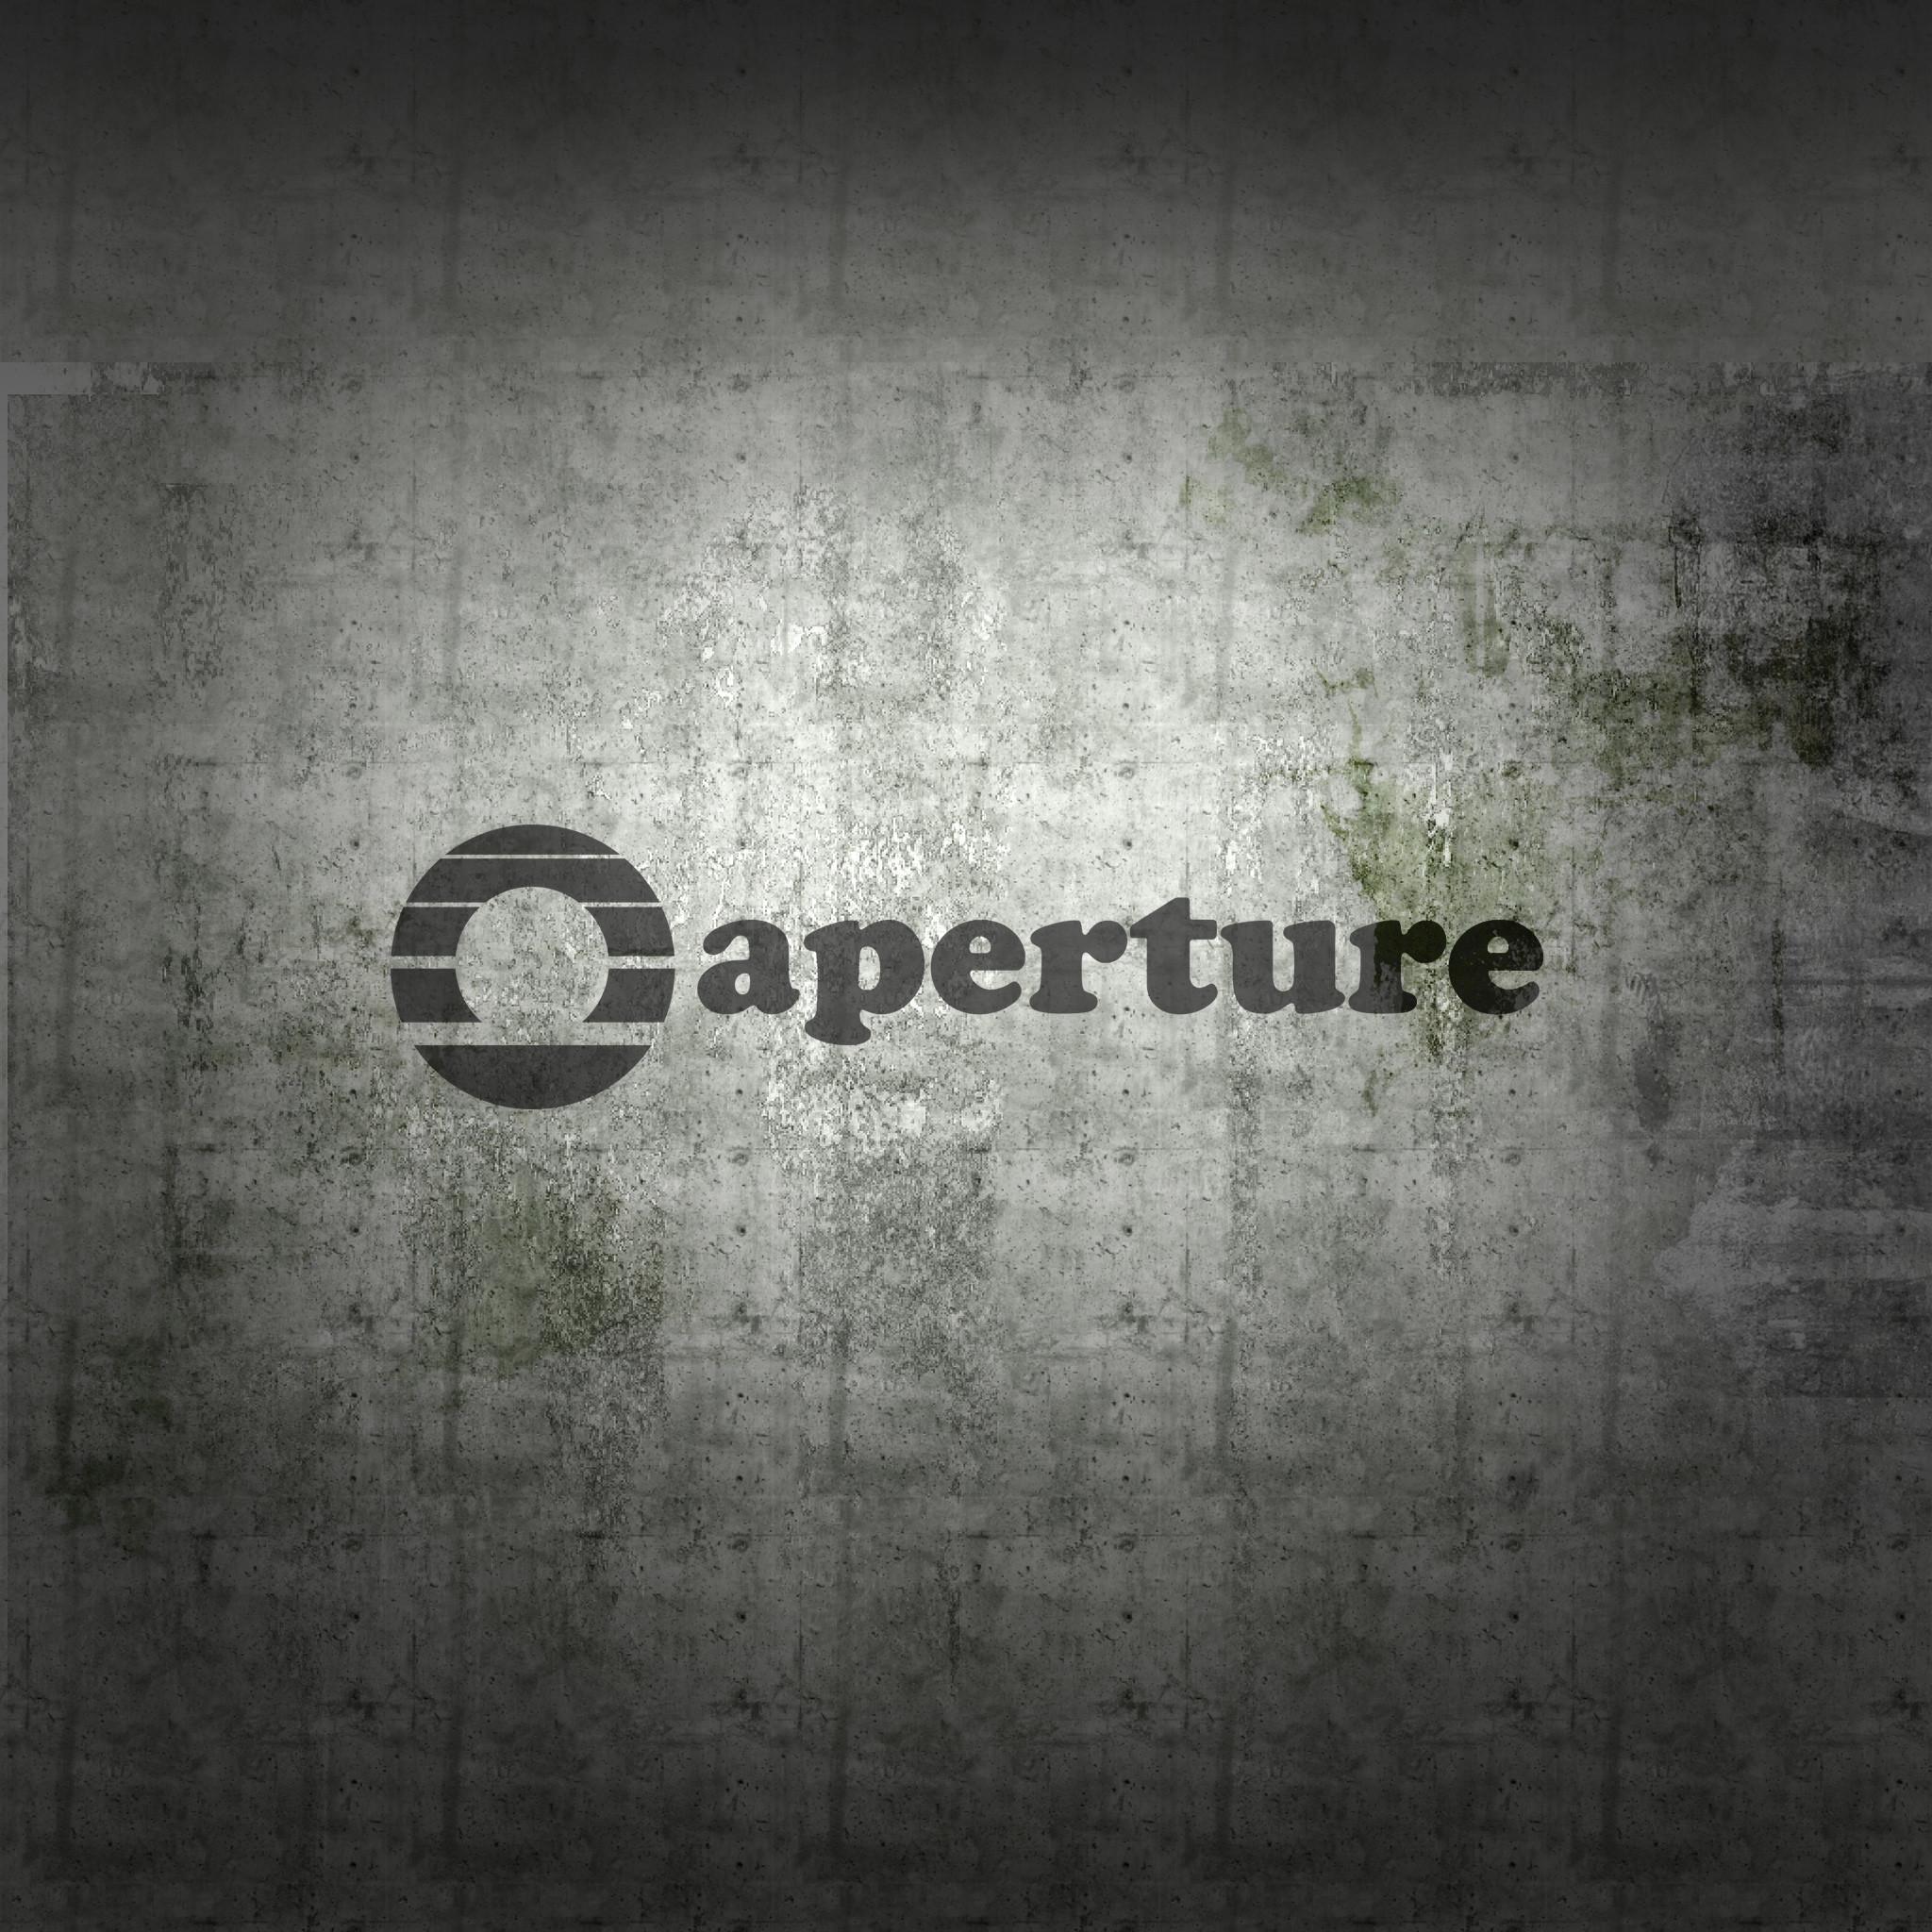 aperture-60s-stone-wall.jpg …